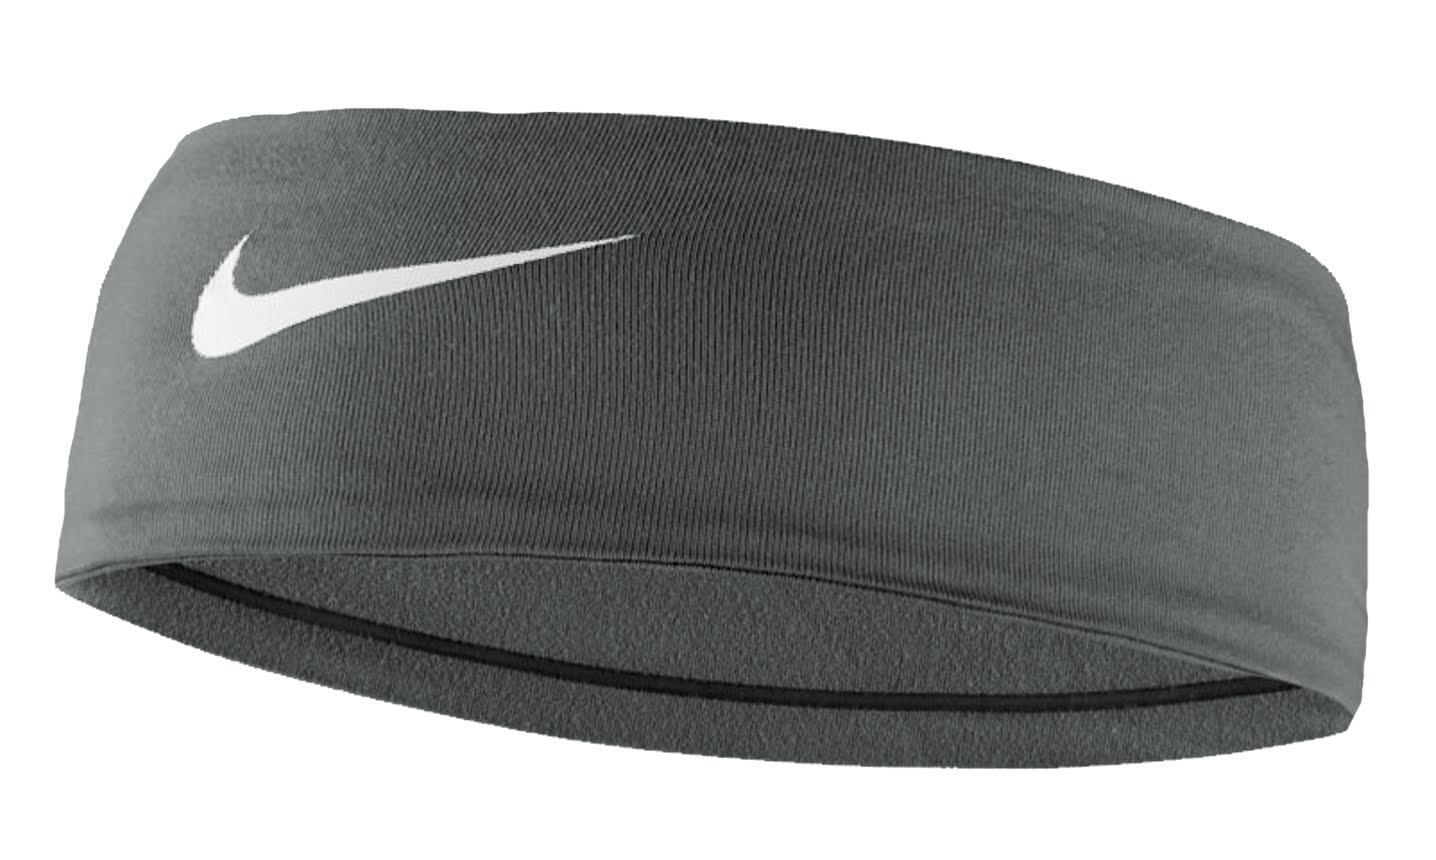 Nike Women's Fury Headband 2.0 Cool Grey/White Size One Size by Nike (Image #1)